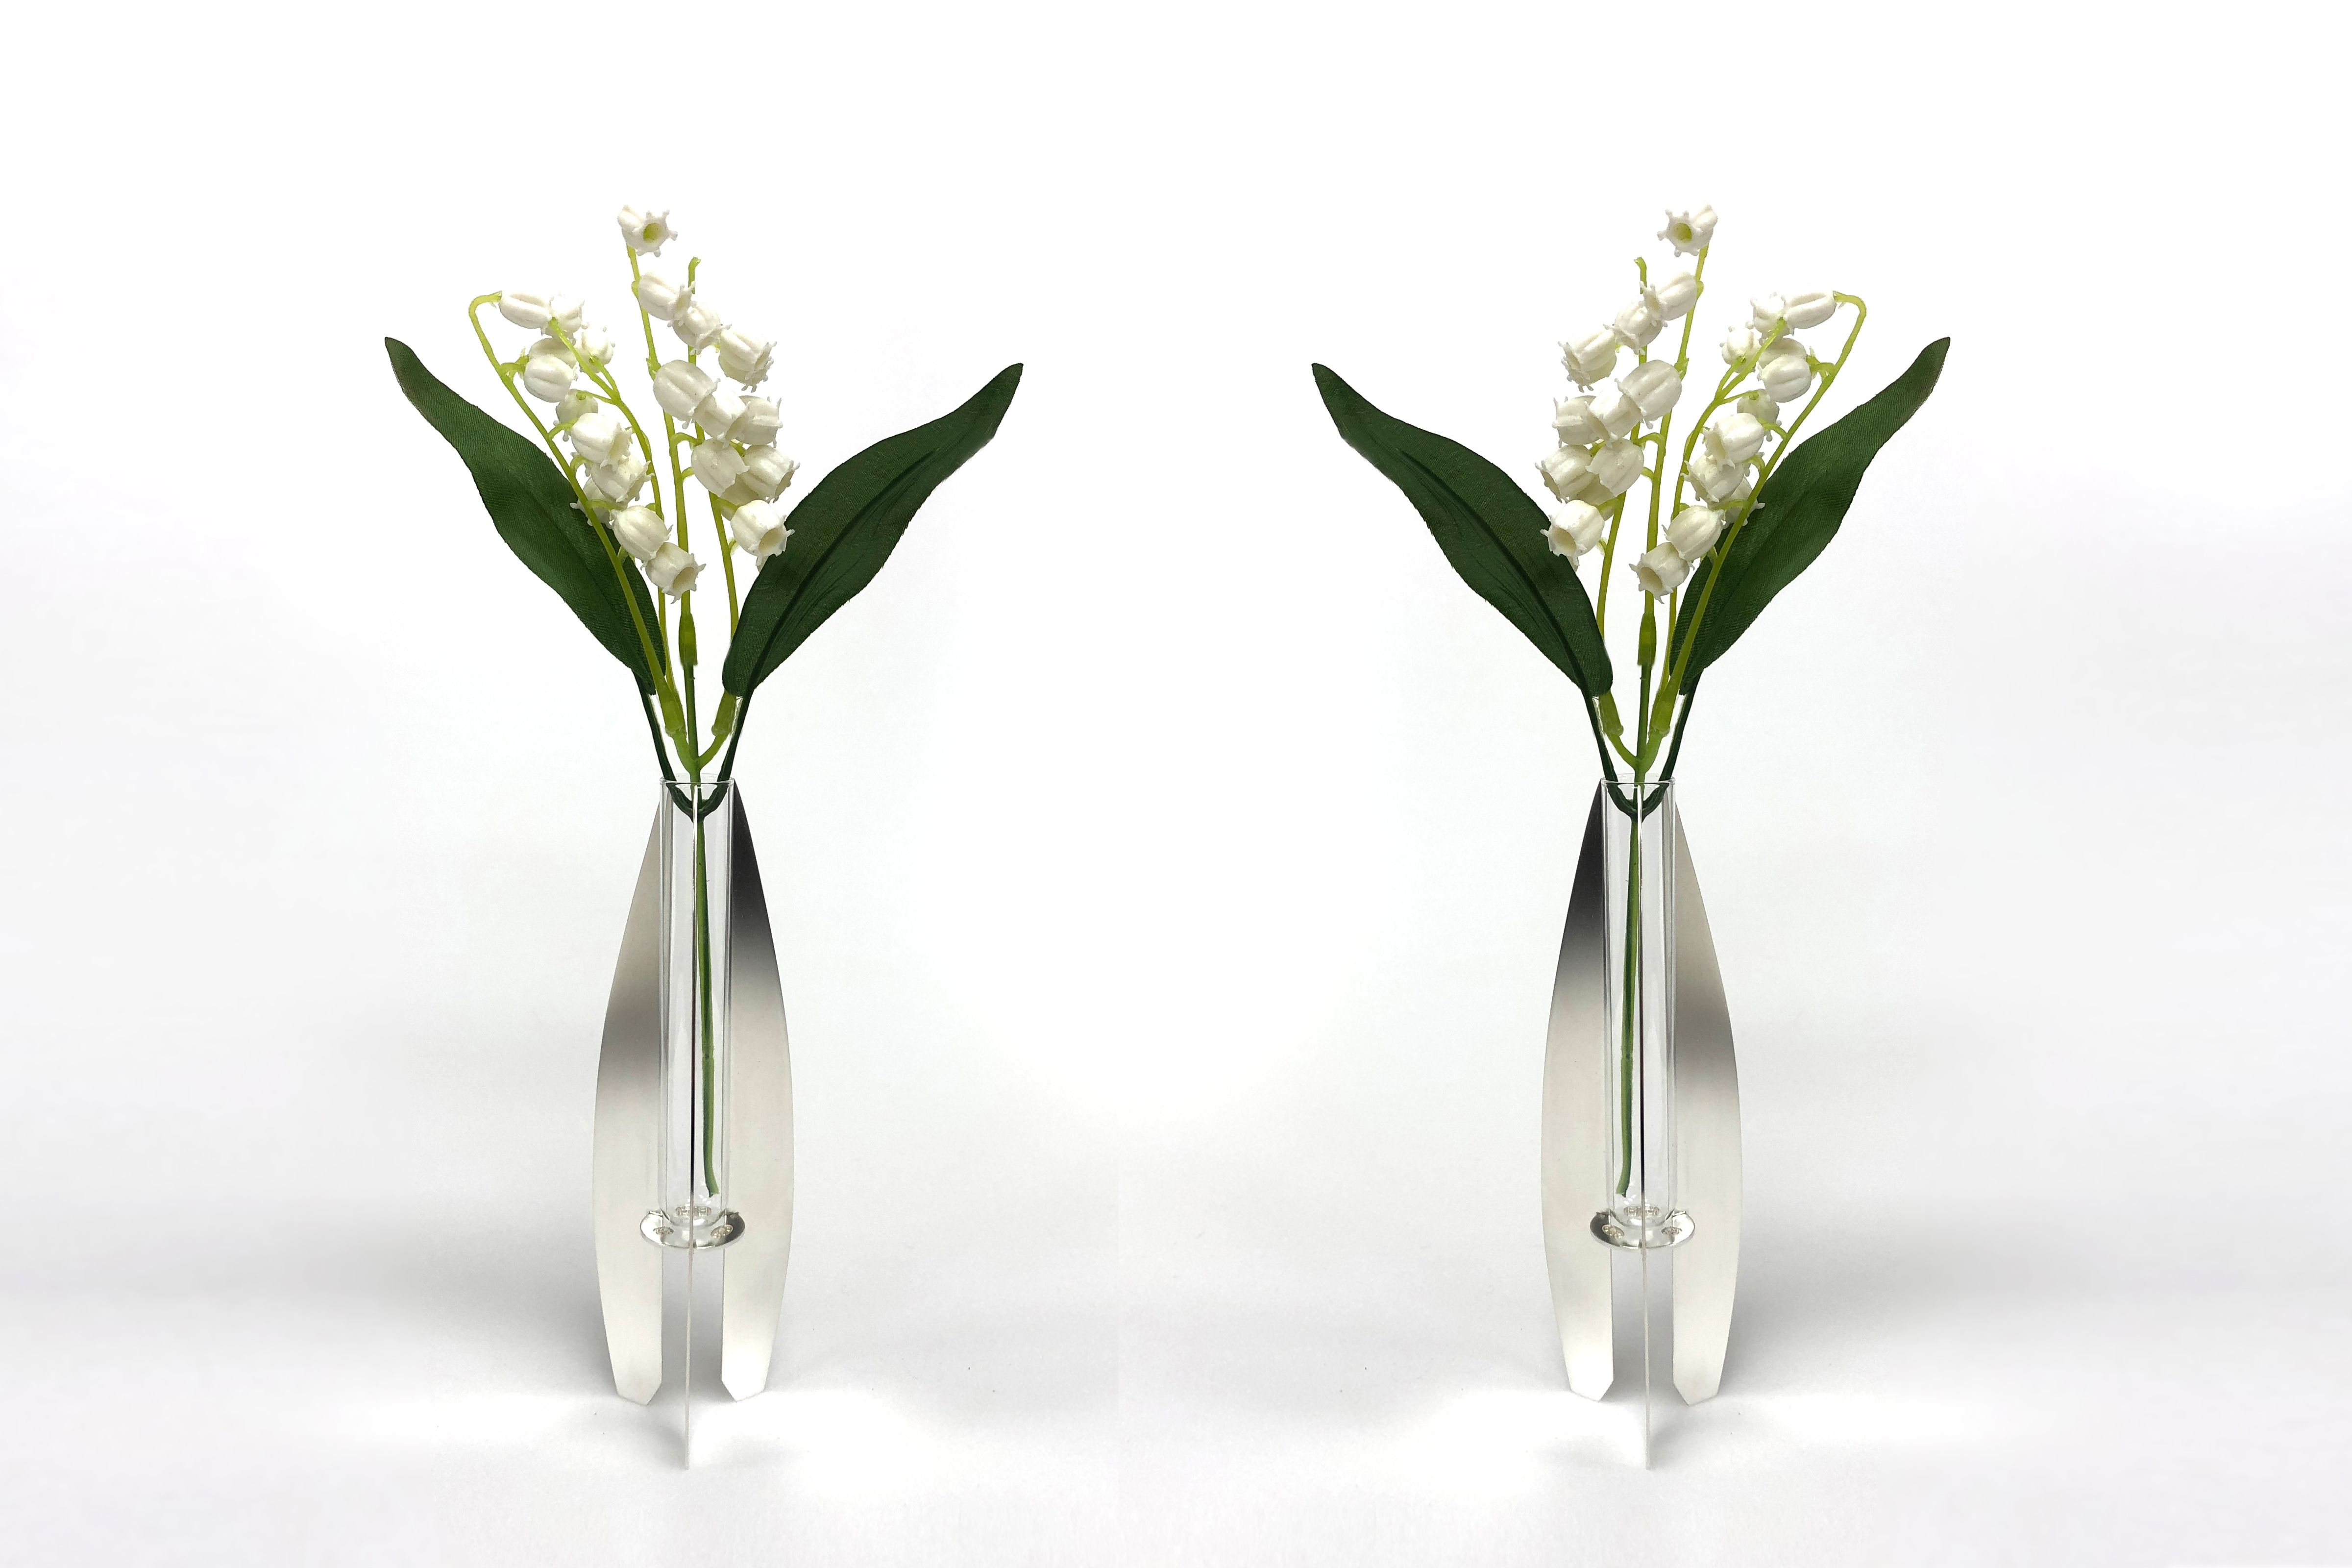 Luna Vases 2 – Copyright BJRdesigns